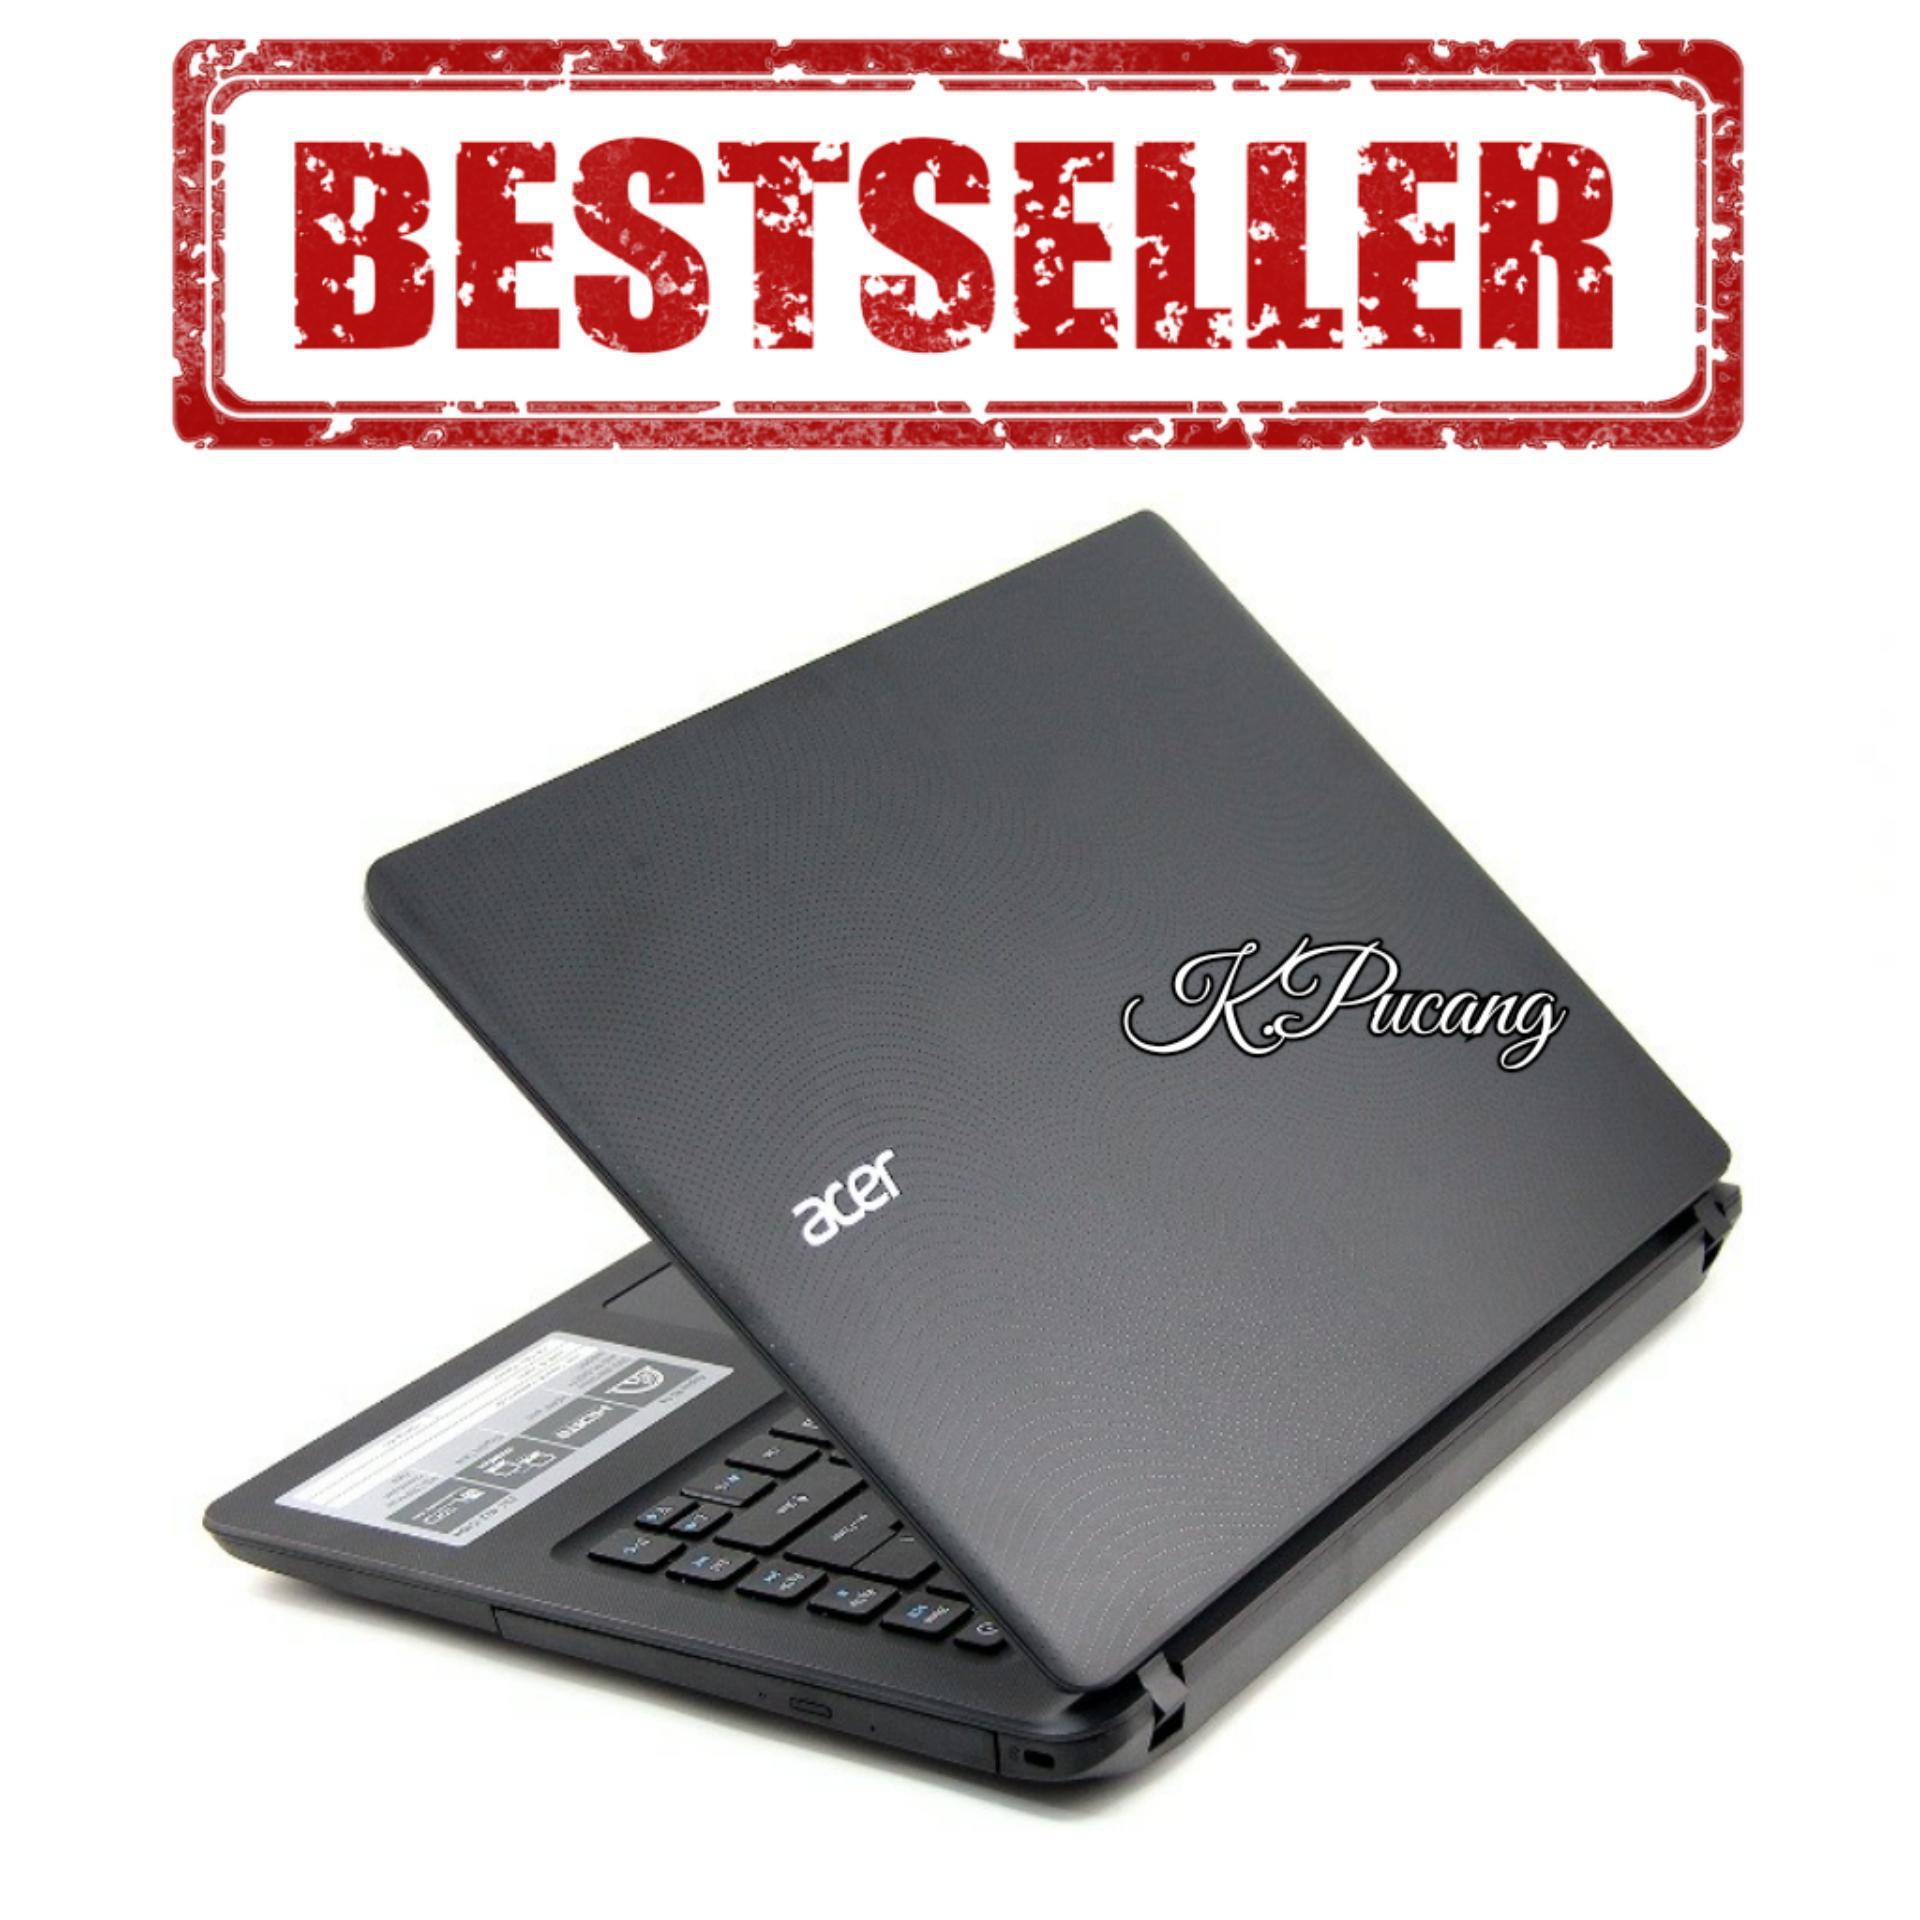 Laptop Acer ES1-432-C45N I RAM 4GB DDR3 I Celeron N3350 I 500GB HDD I DVDRW I 14